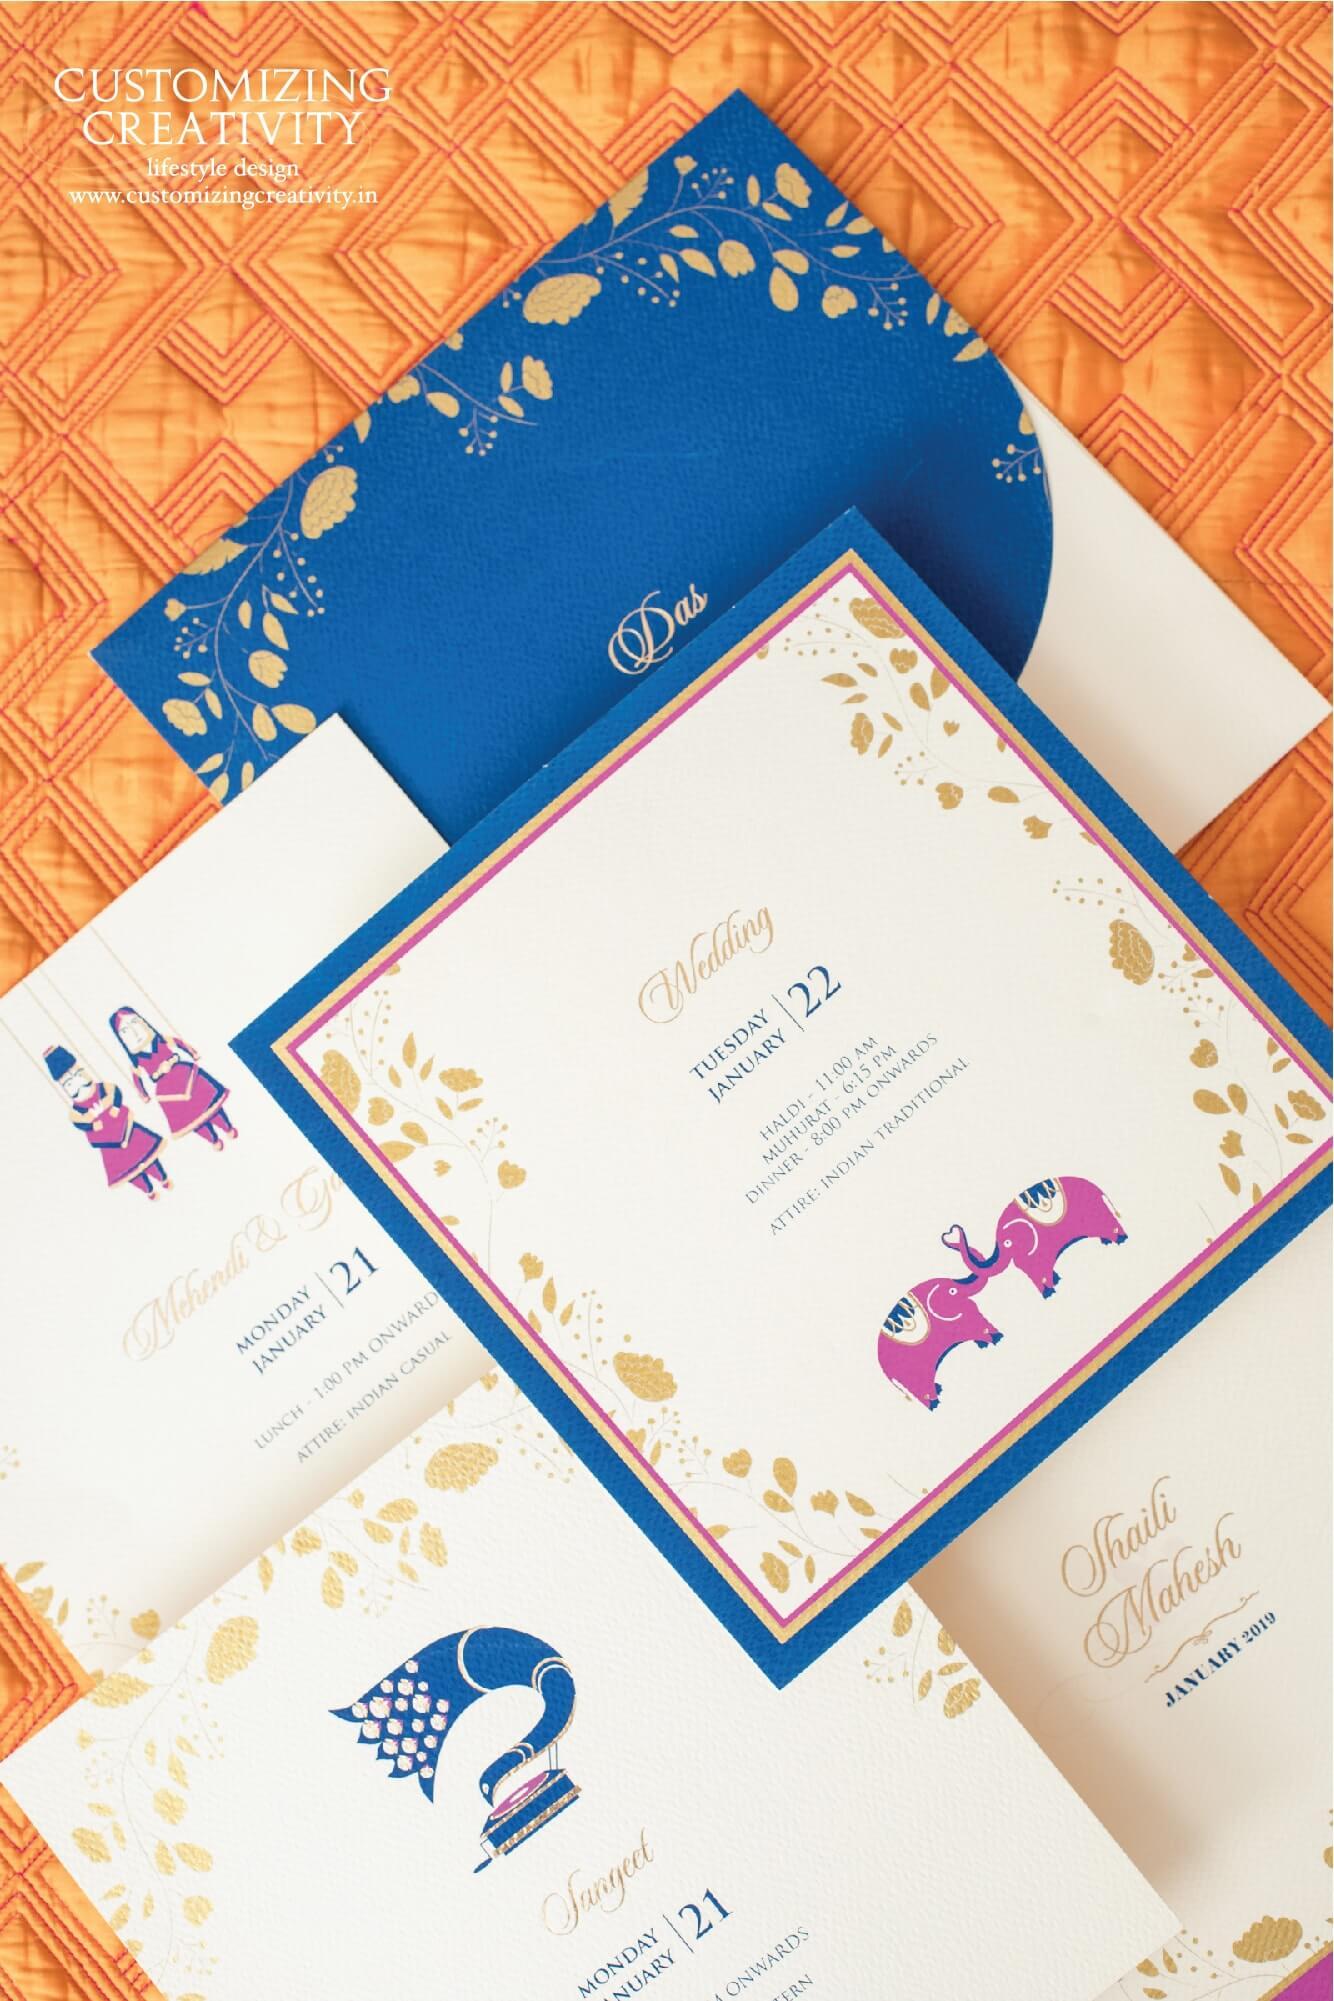 Customized Cards and Unique Wedding Invitations – Customizing Creativity